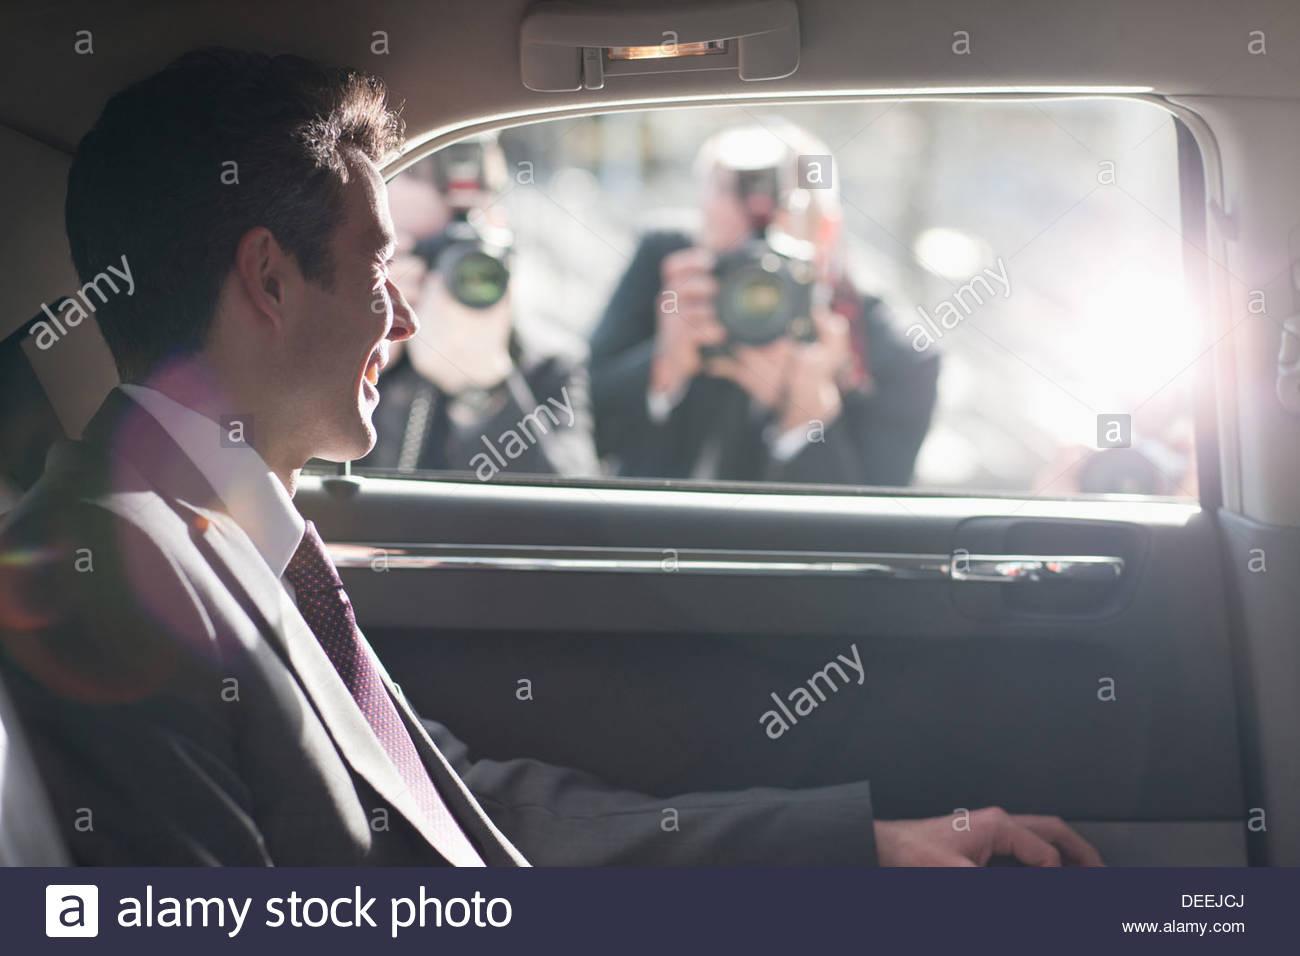 Politiker Lächeln für Paparazzi auf Rücksitz des Autos Stockbild